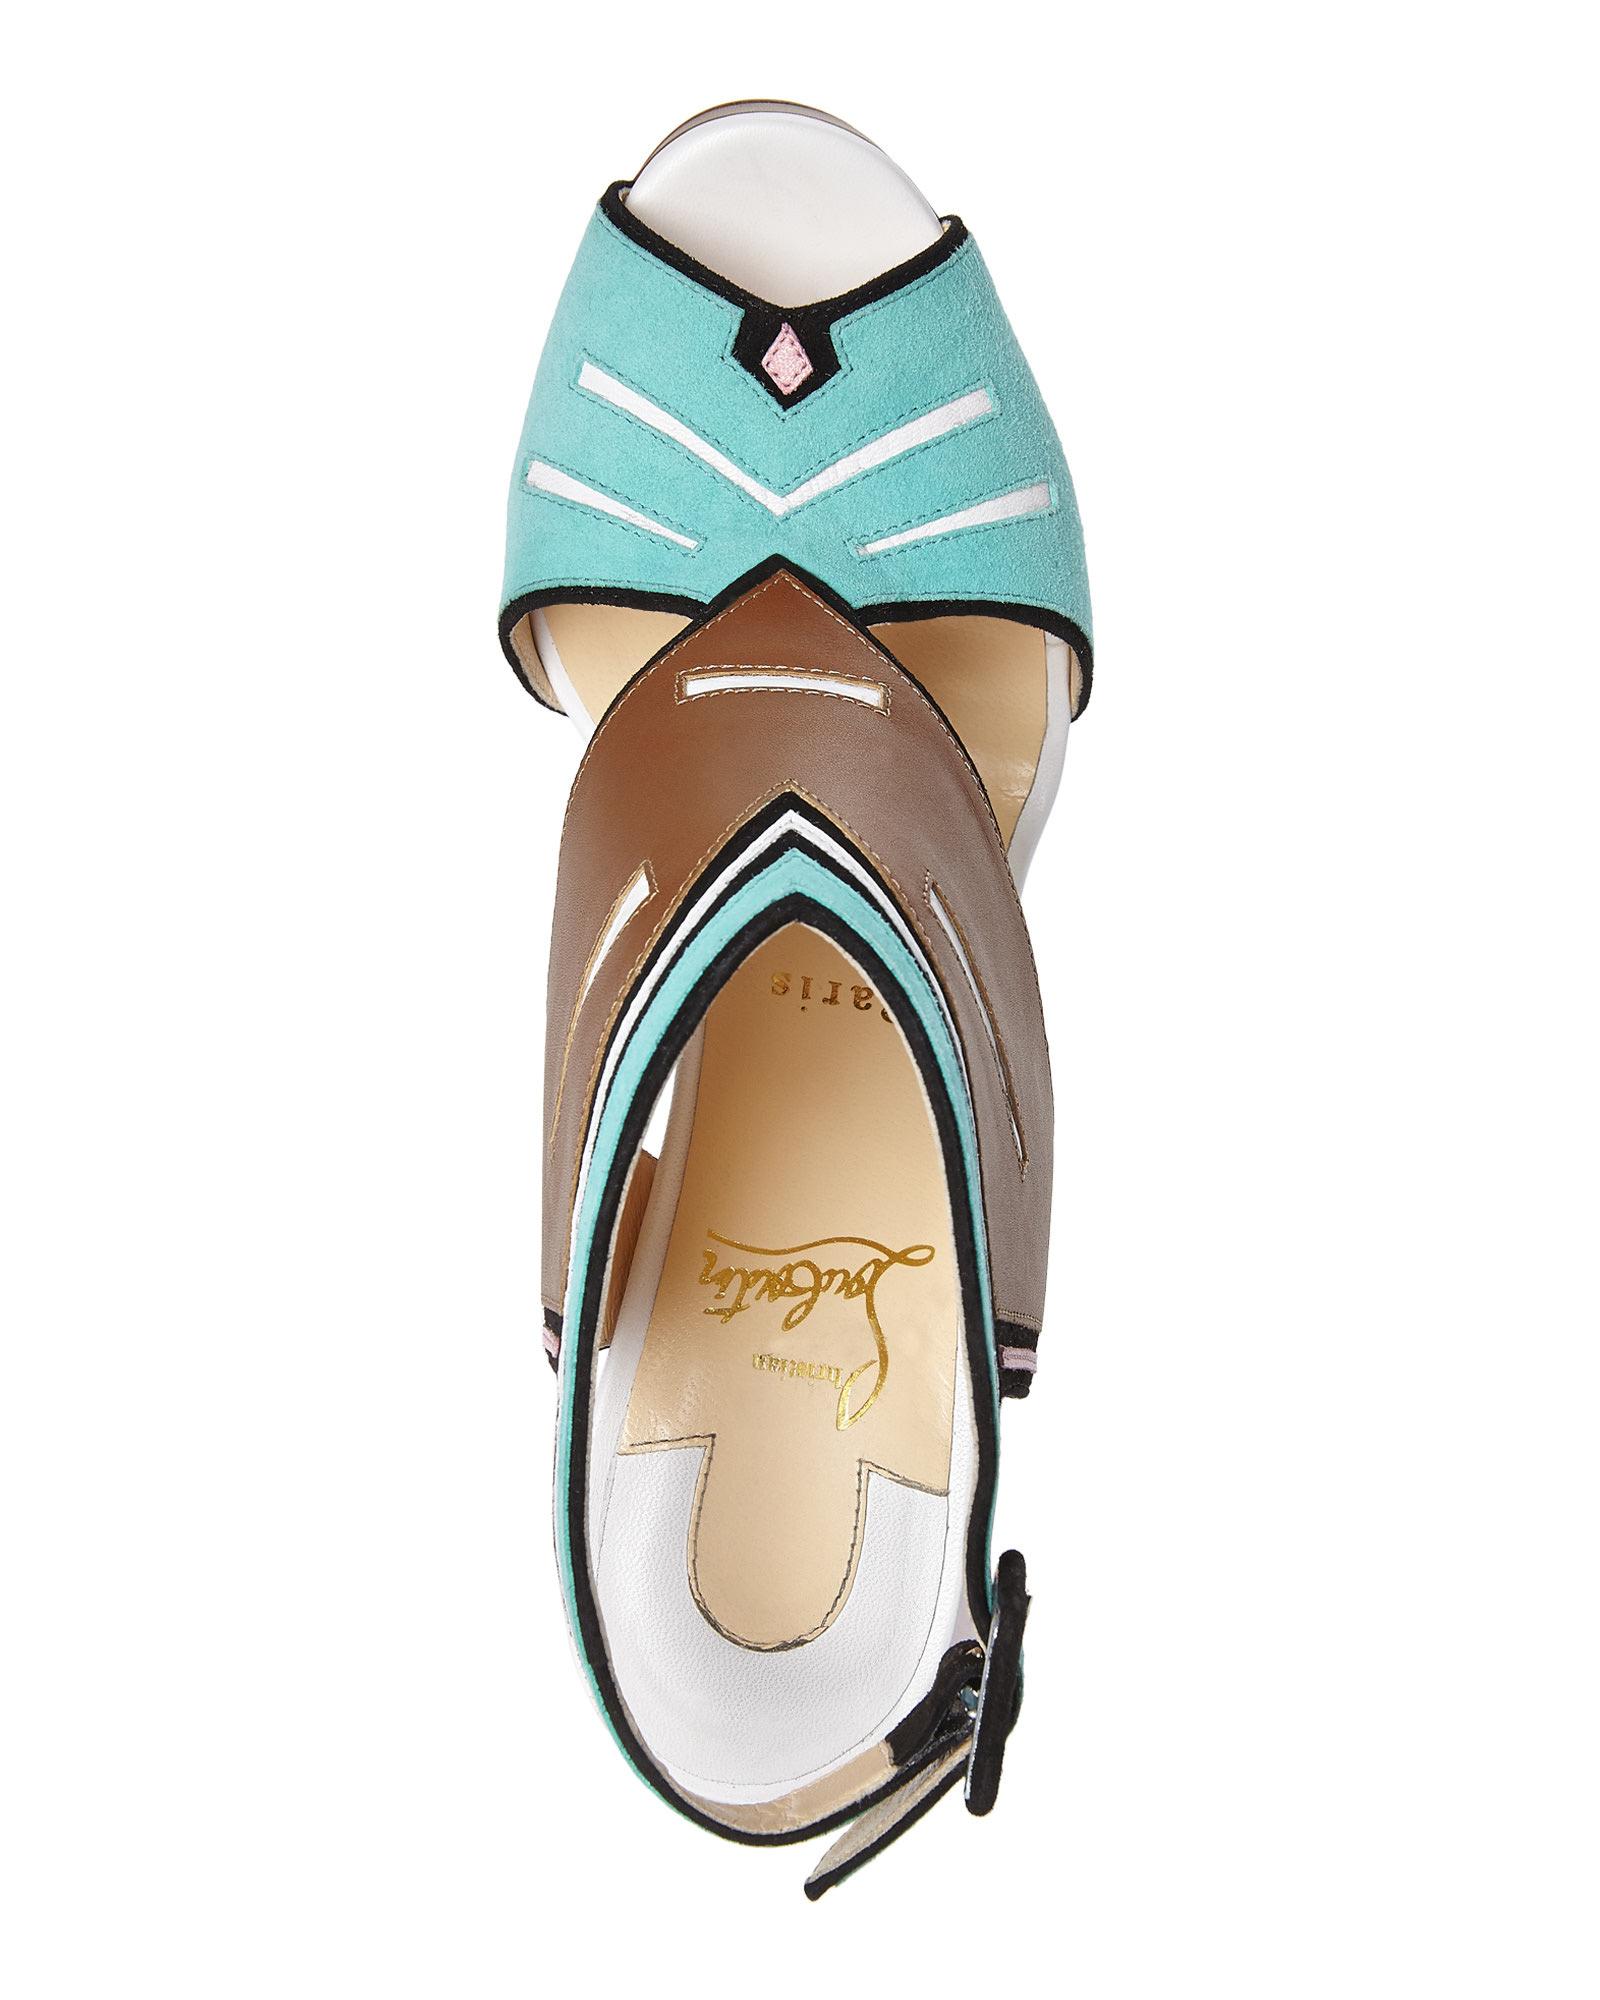 christian louboutin shoe prices - christian louboutin women's ziggoo sandals, christian louboutin copies